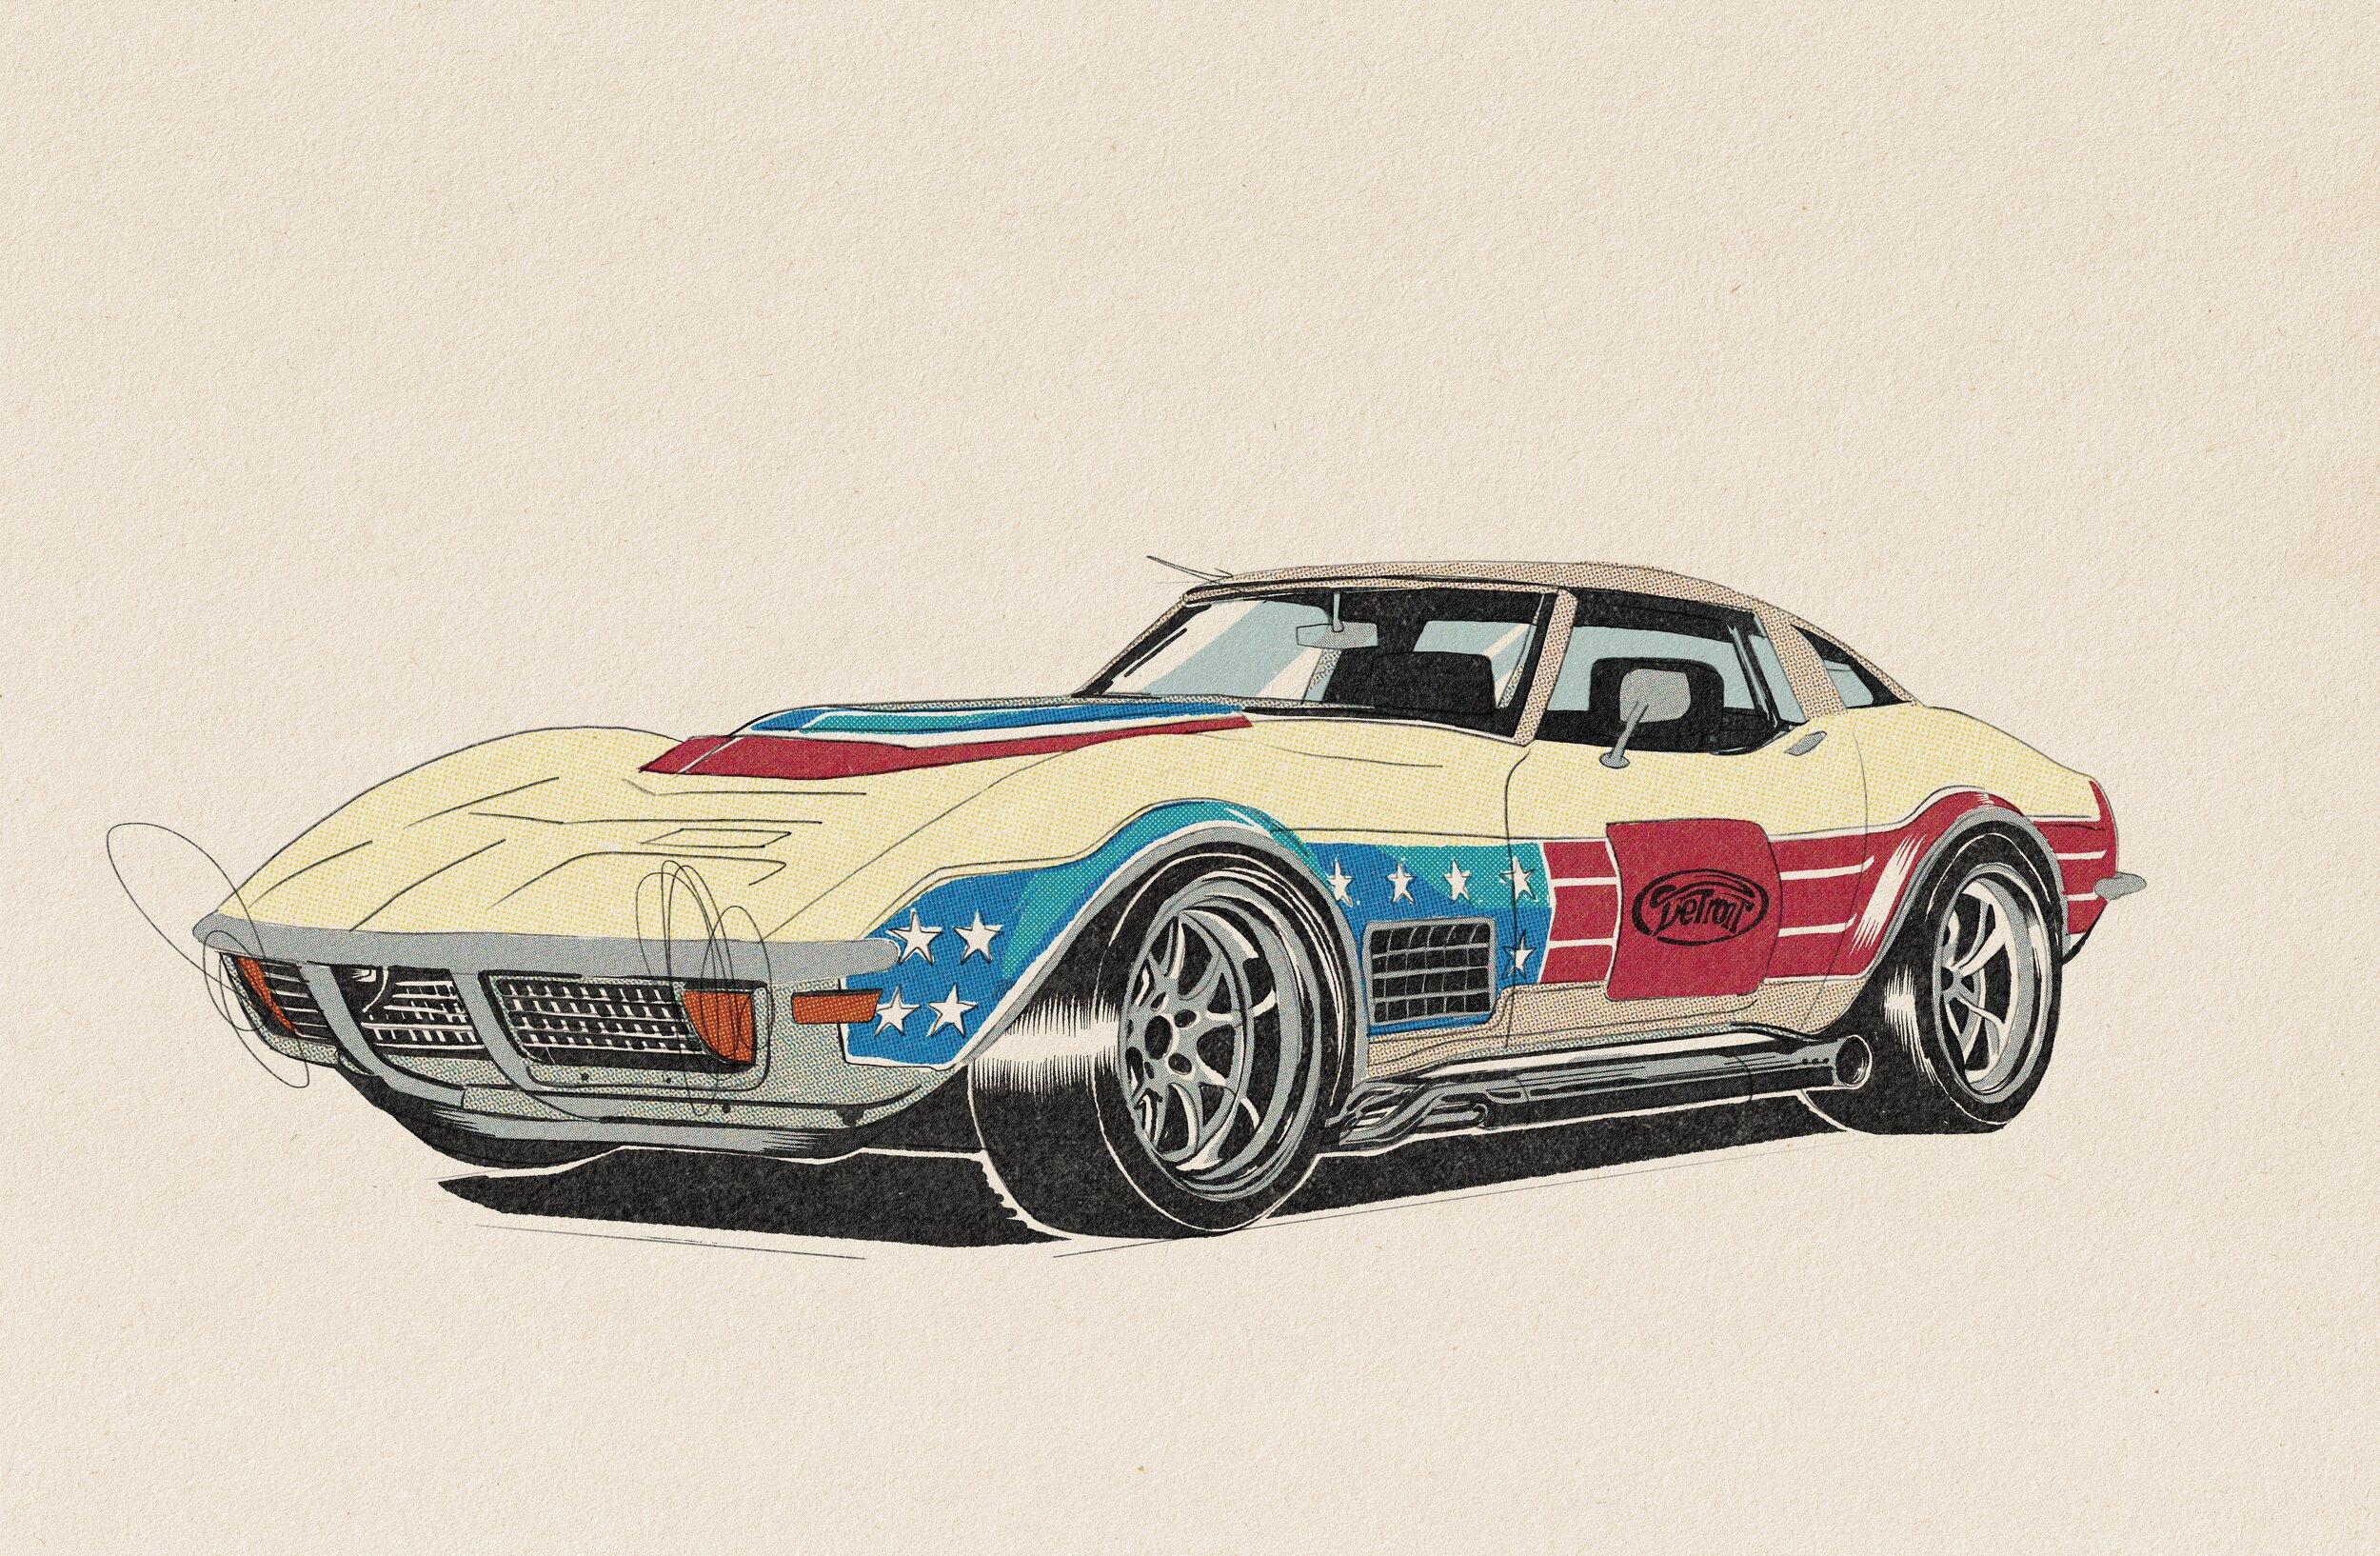 Hot_Wheels_Corvette_Illustration_Art_Of_Racing